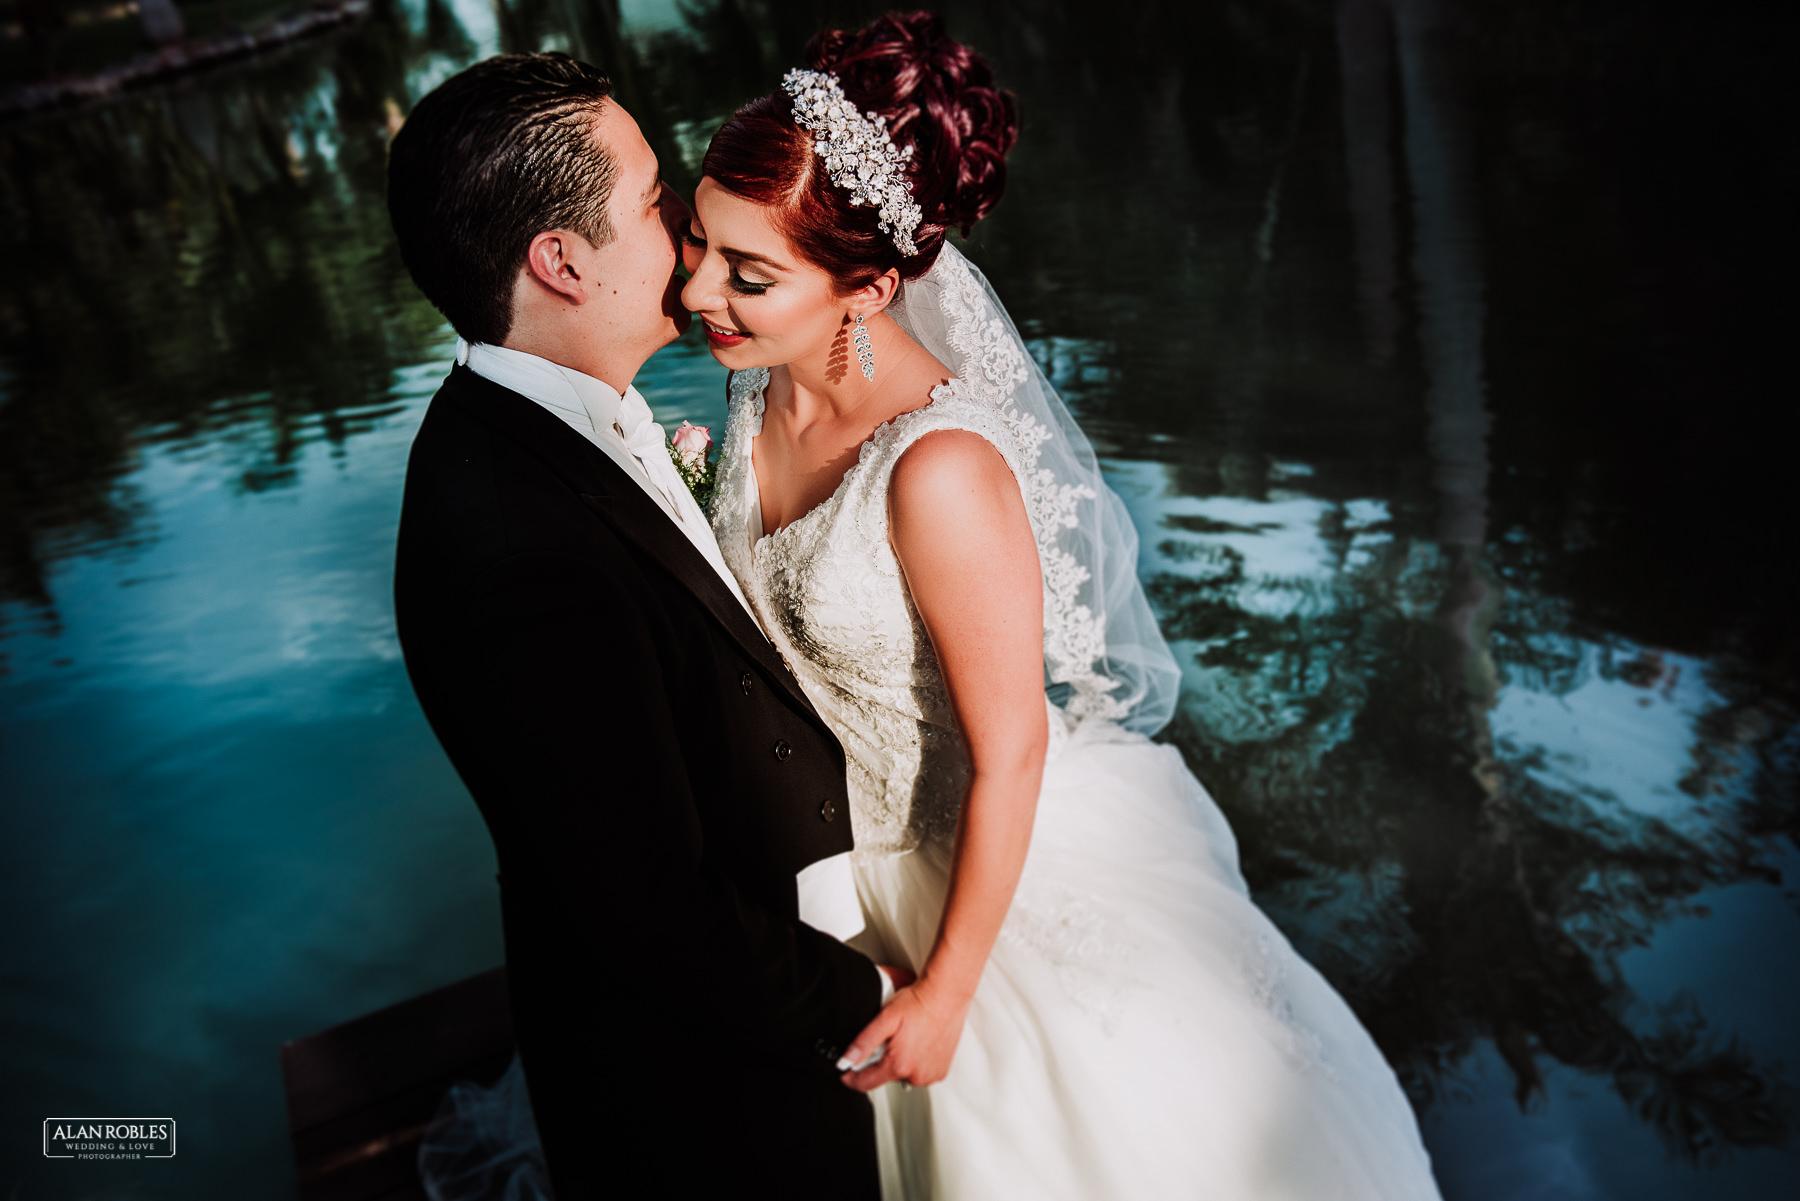 Alan Robles fotografo de bodas guadalajara - LyP Hotel Demetria-53